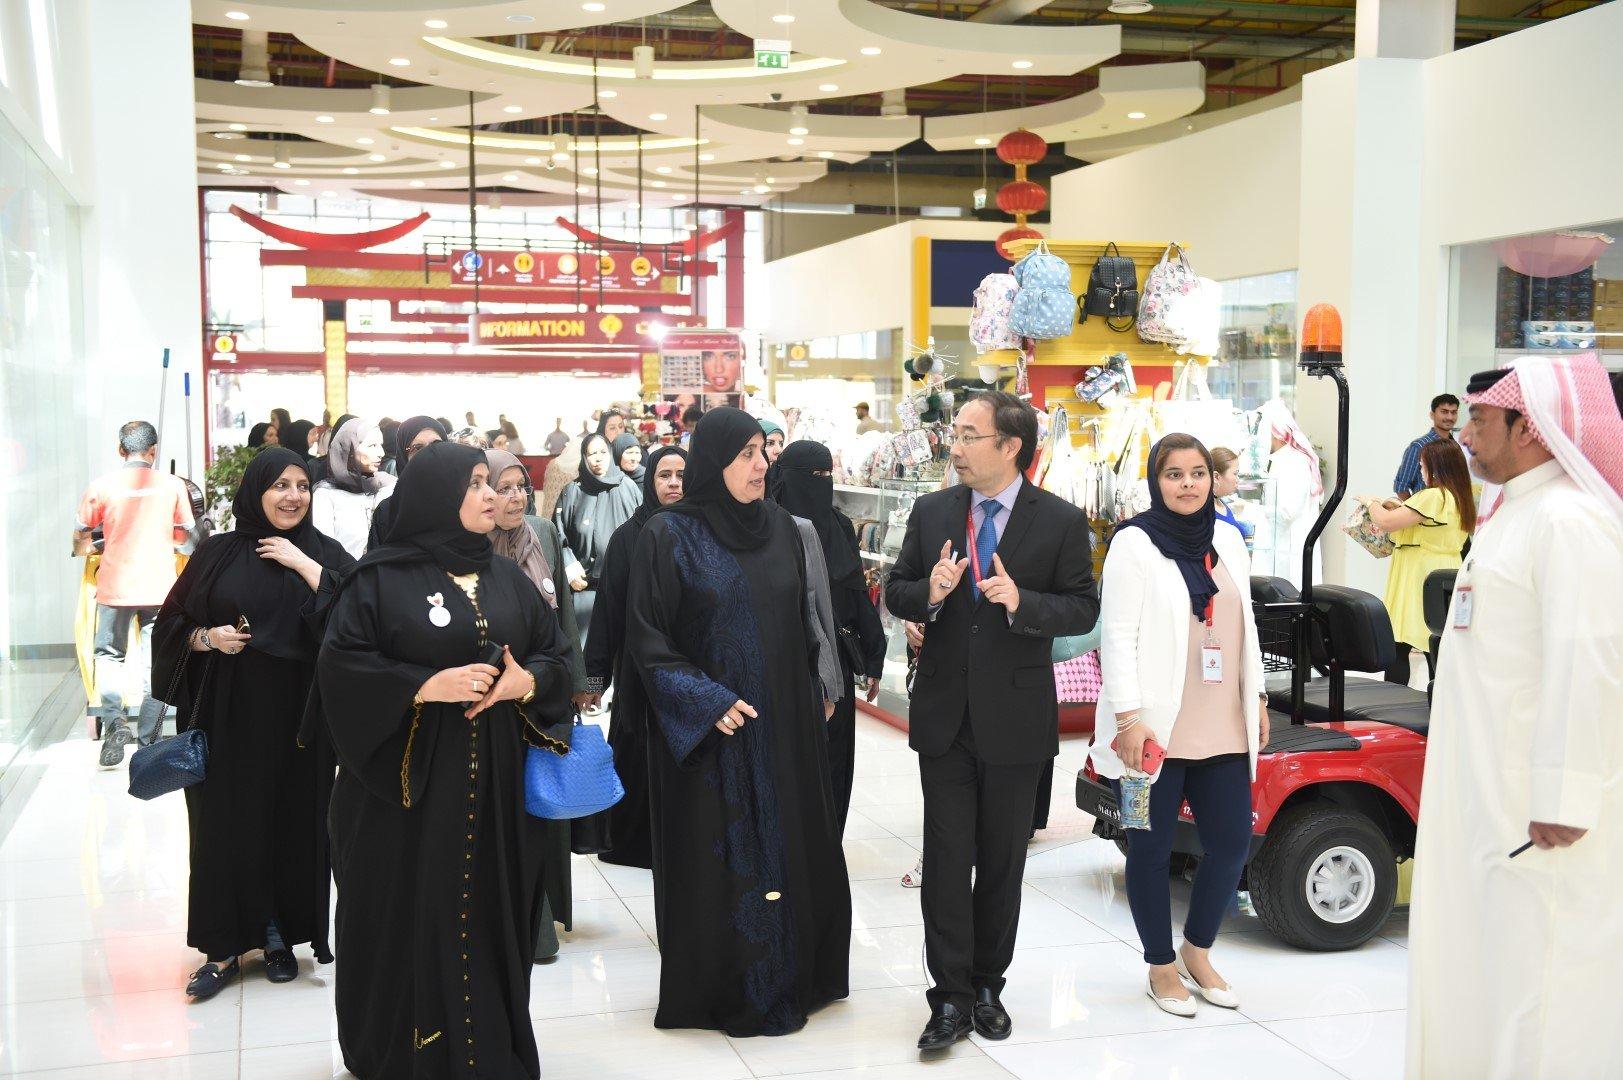 Al Noor Visit to Dragon City Bahrain - Dragon City Bahrain